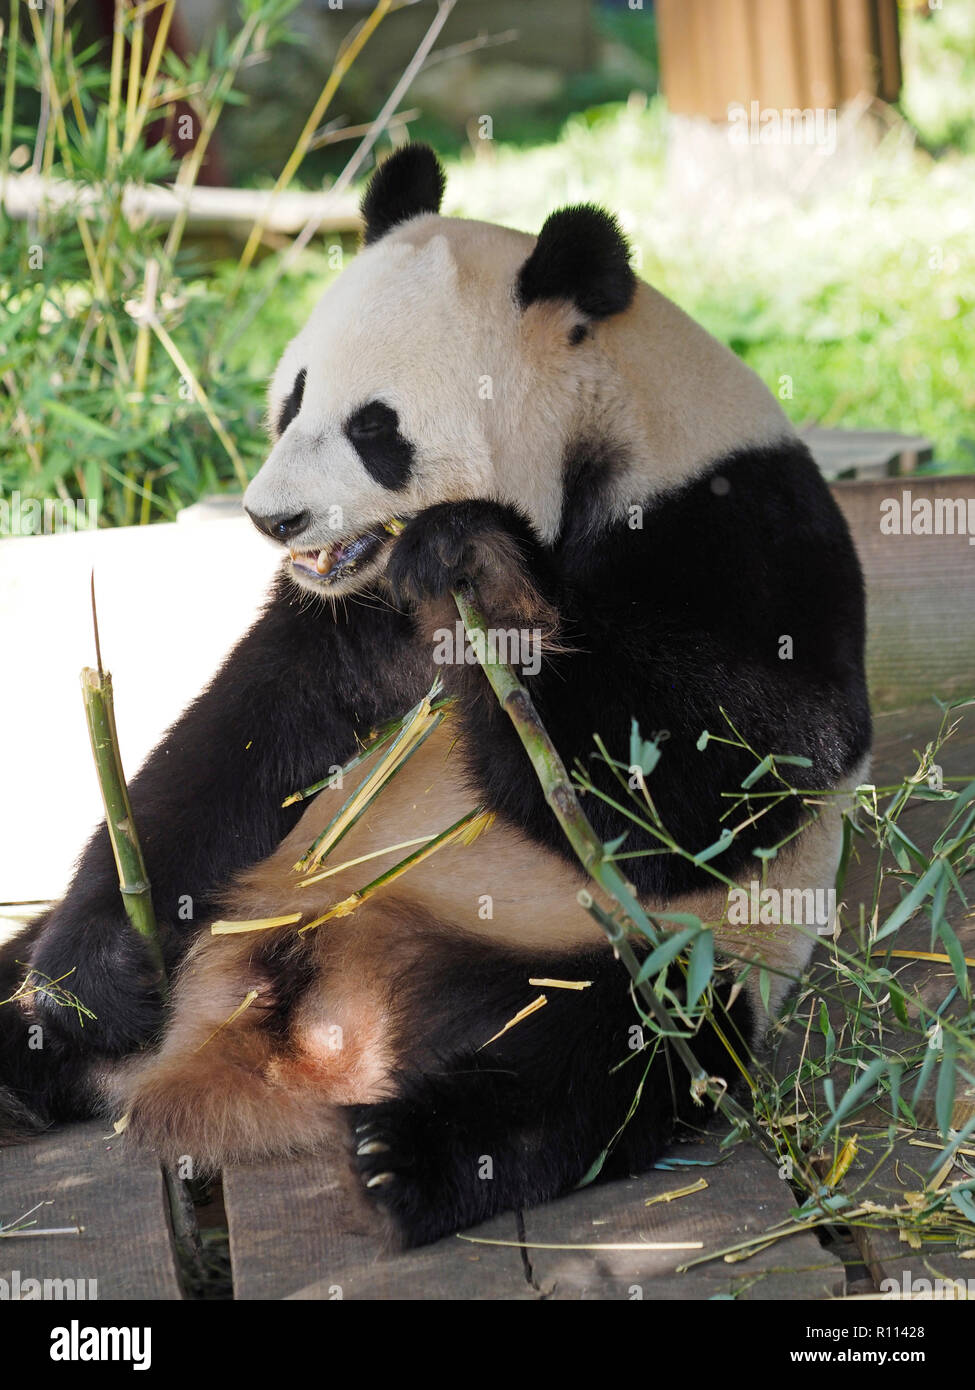 Panda Bar Sitzend Wahrend Bambus Essen Rhenen Zoo Den